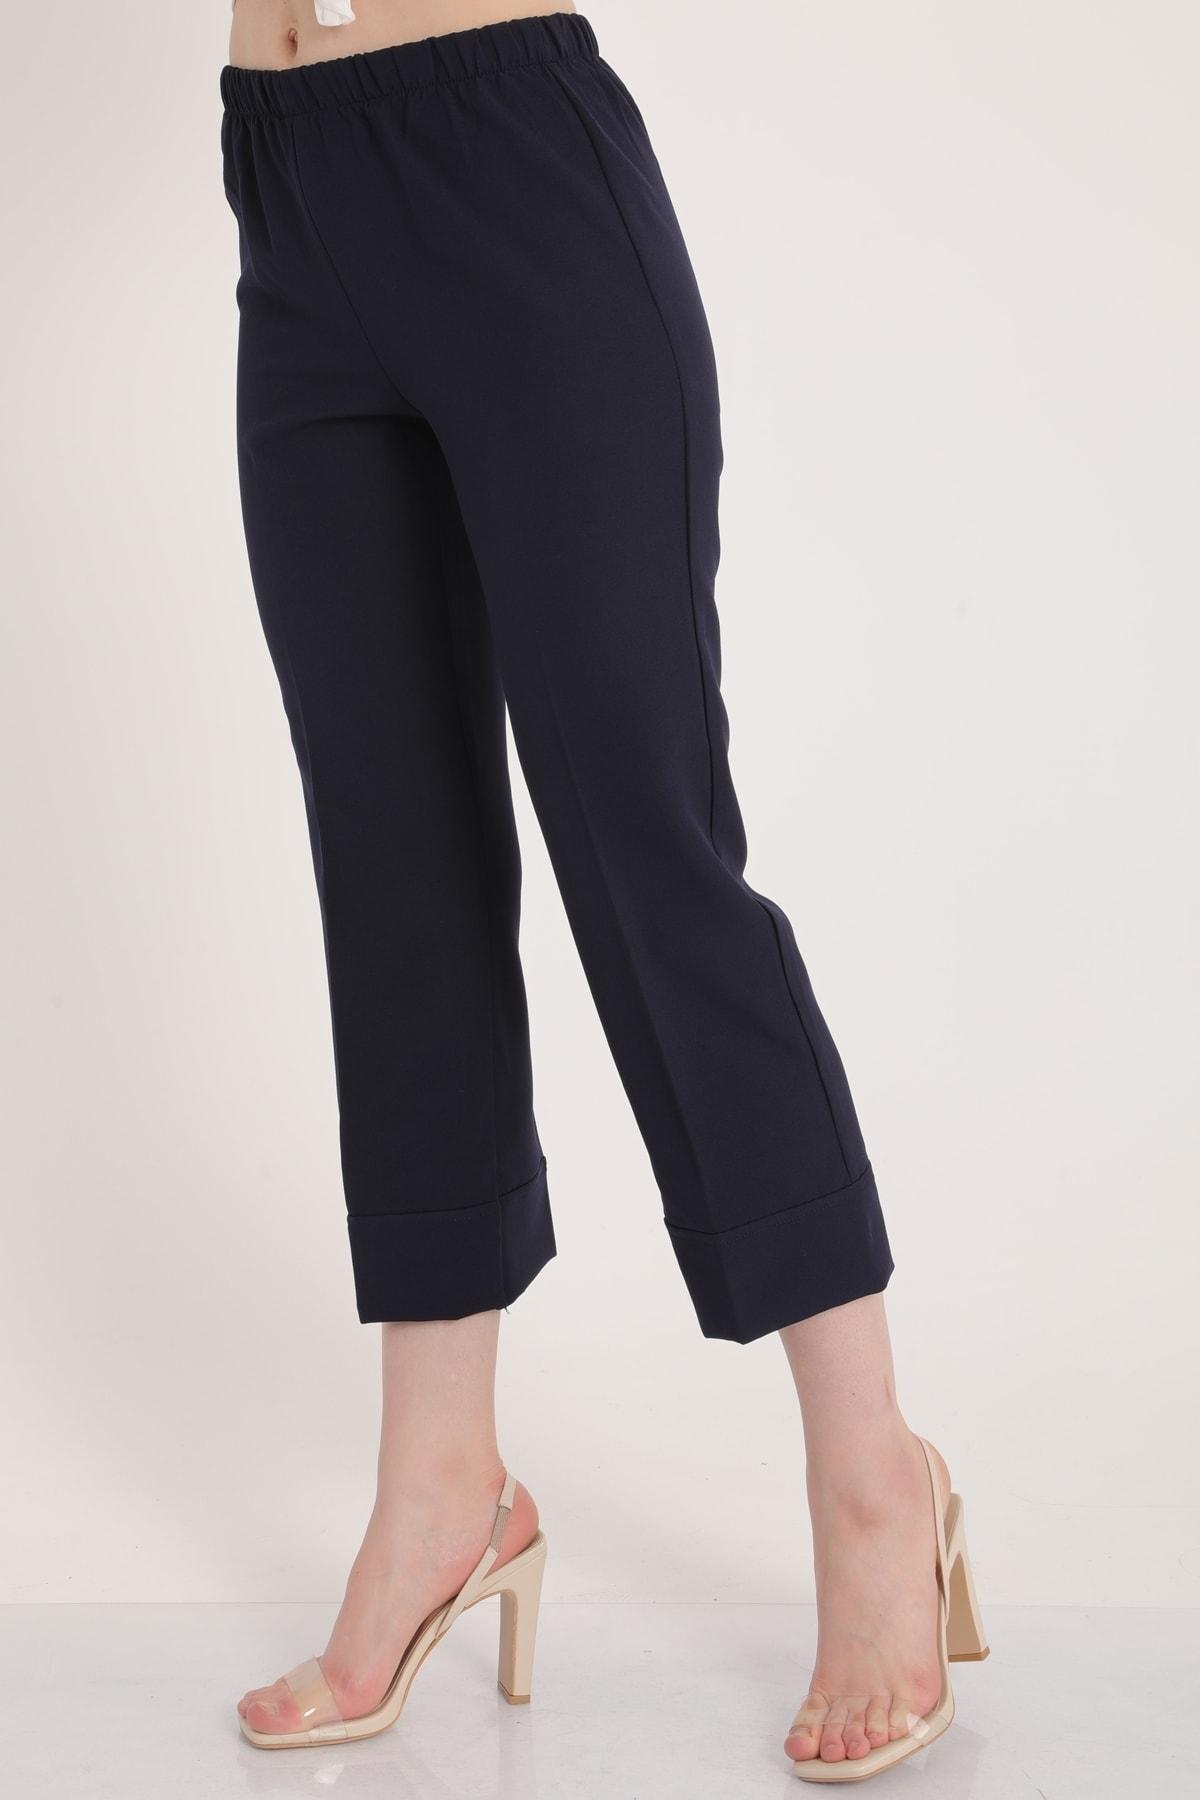 MD trend Kadın Lacivert Bel Lastikli Duble Paça Rahat Kumaş Pantolon Mdt5279 2